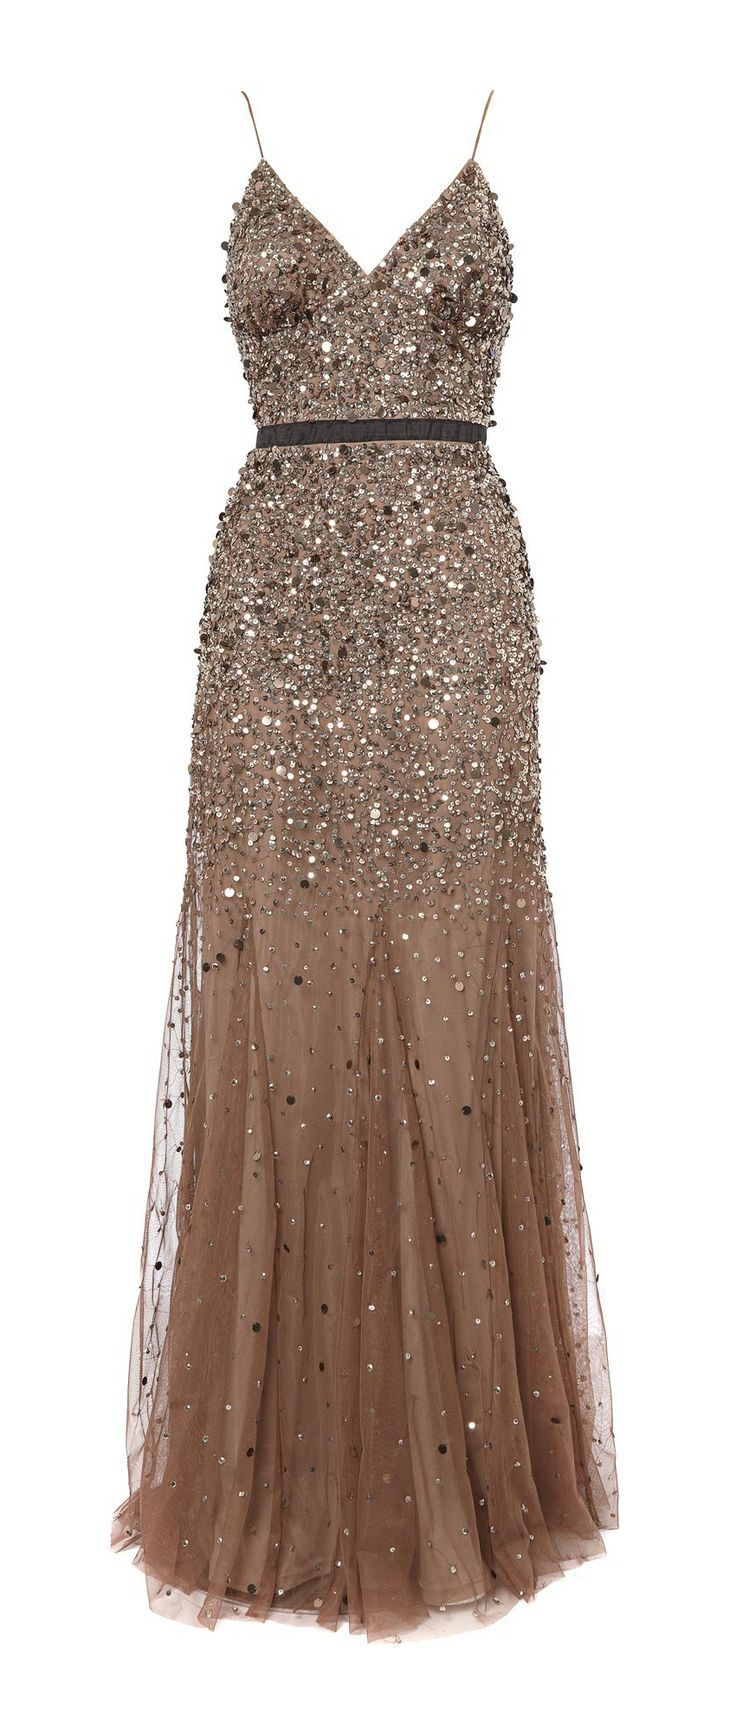 Pin by imogene rousseau on nails world pinterest dream dress